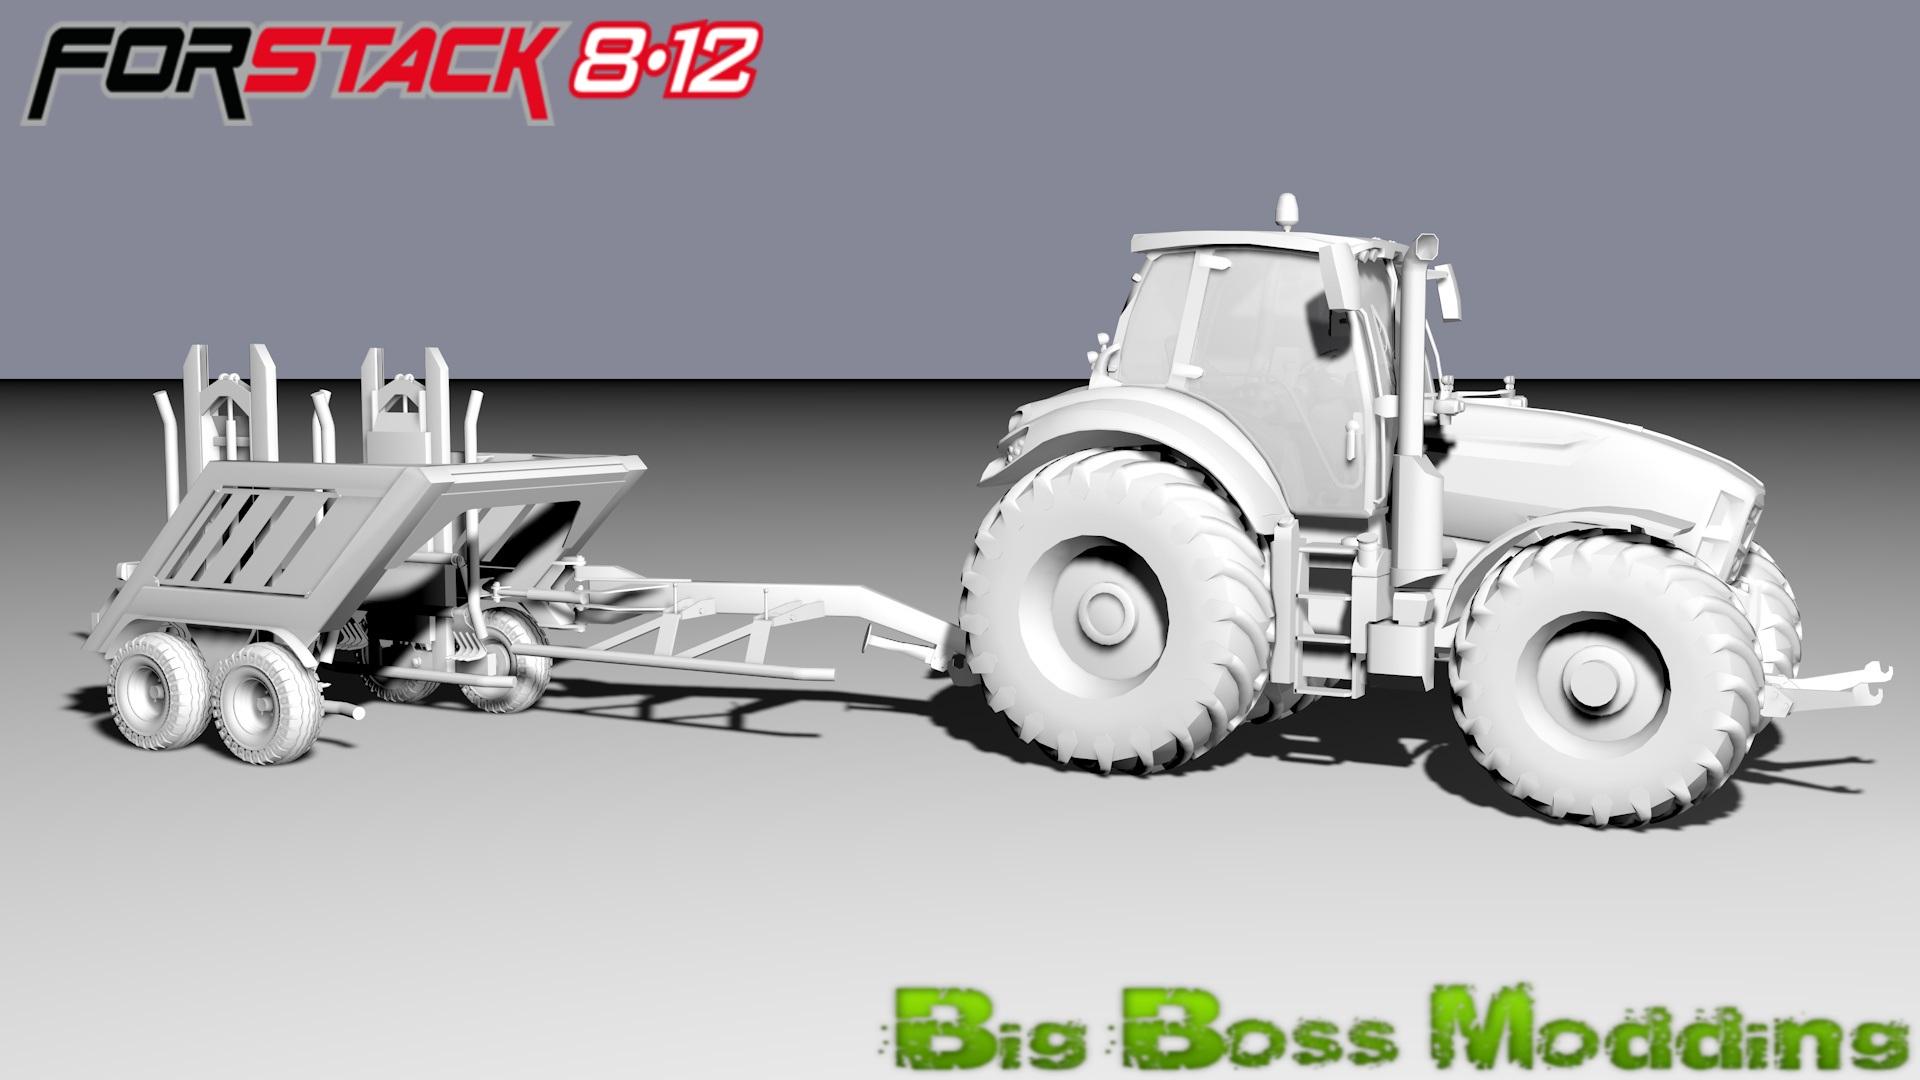 [T.E.P.] Arcusin ForStack 8-12 [Actualizado 30-5-2014] Contractor295j8h